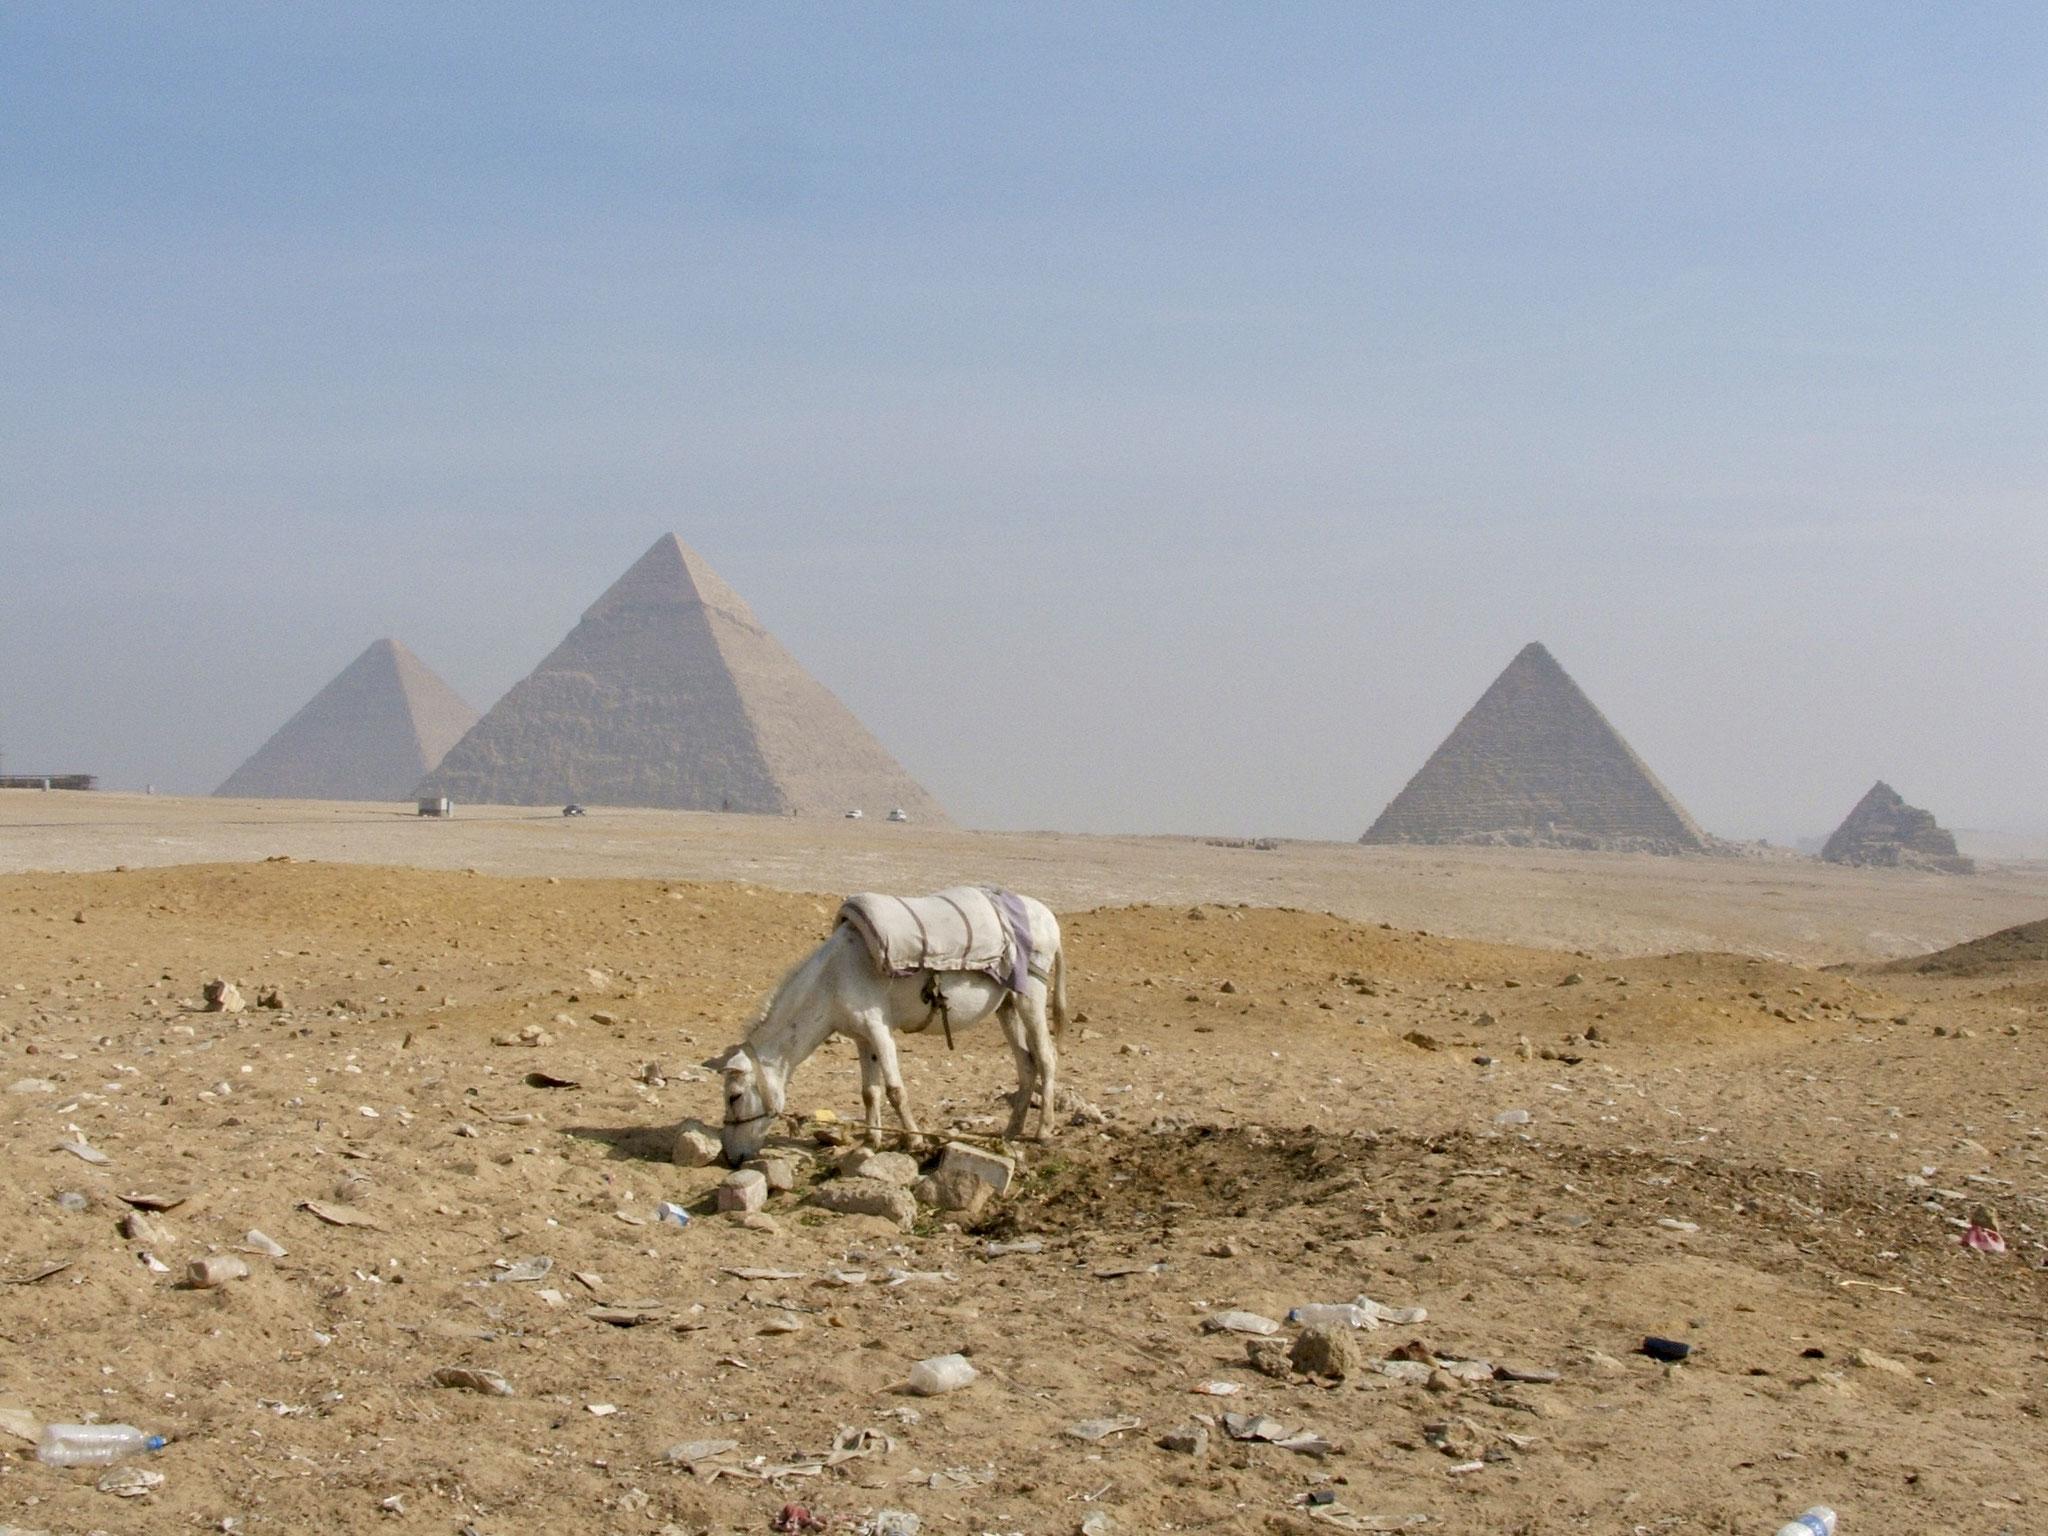 Tethered grazing goat-slim pickings, Giza